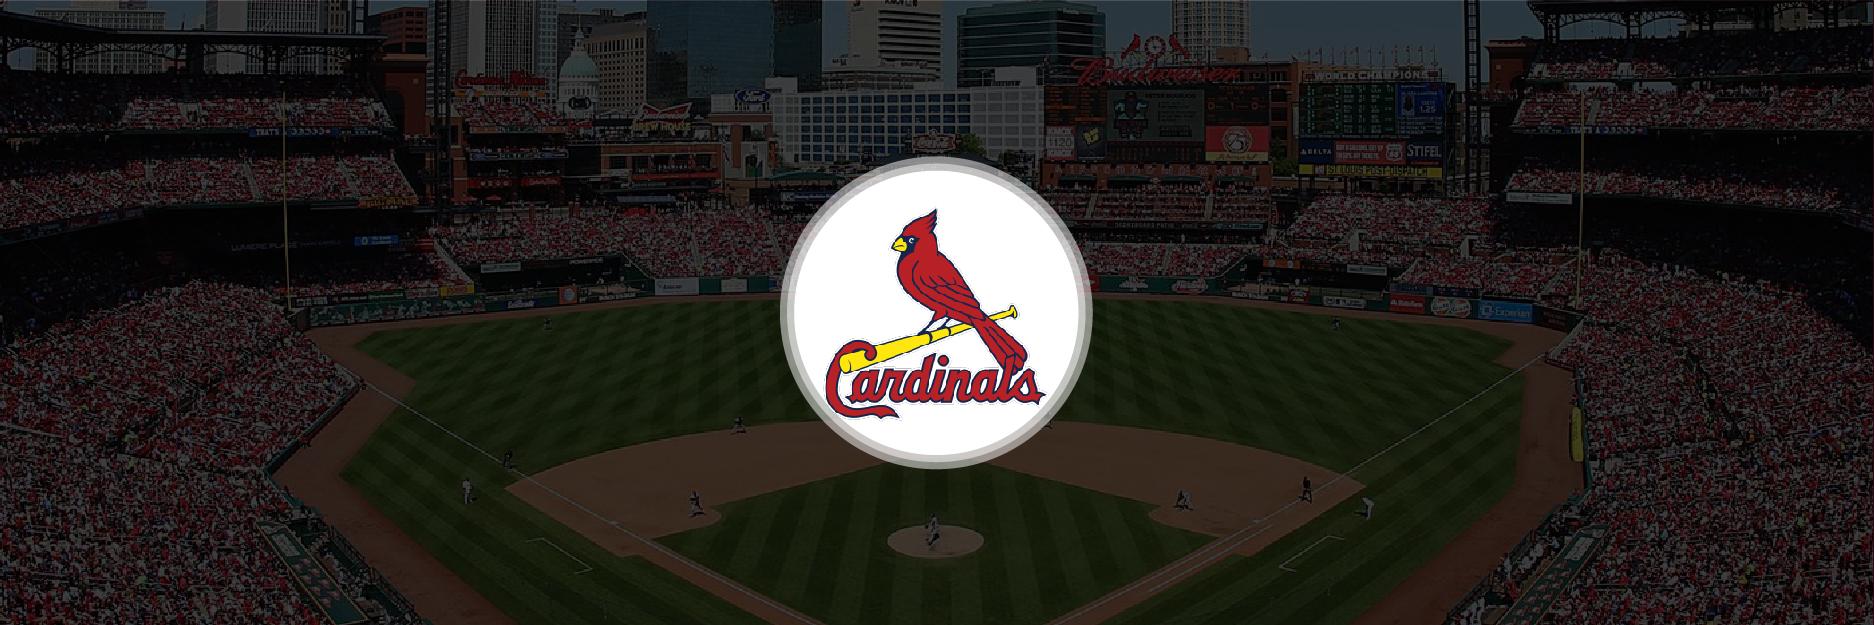 St. Louis Cardinals 2020 Pre-Season Analysis